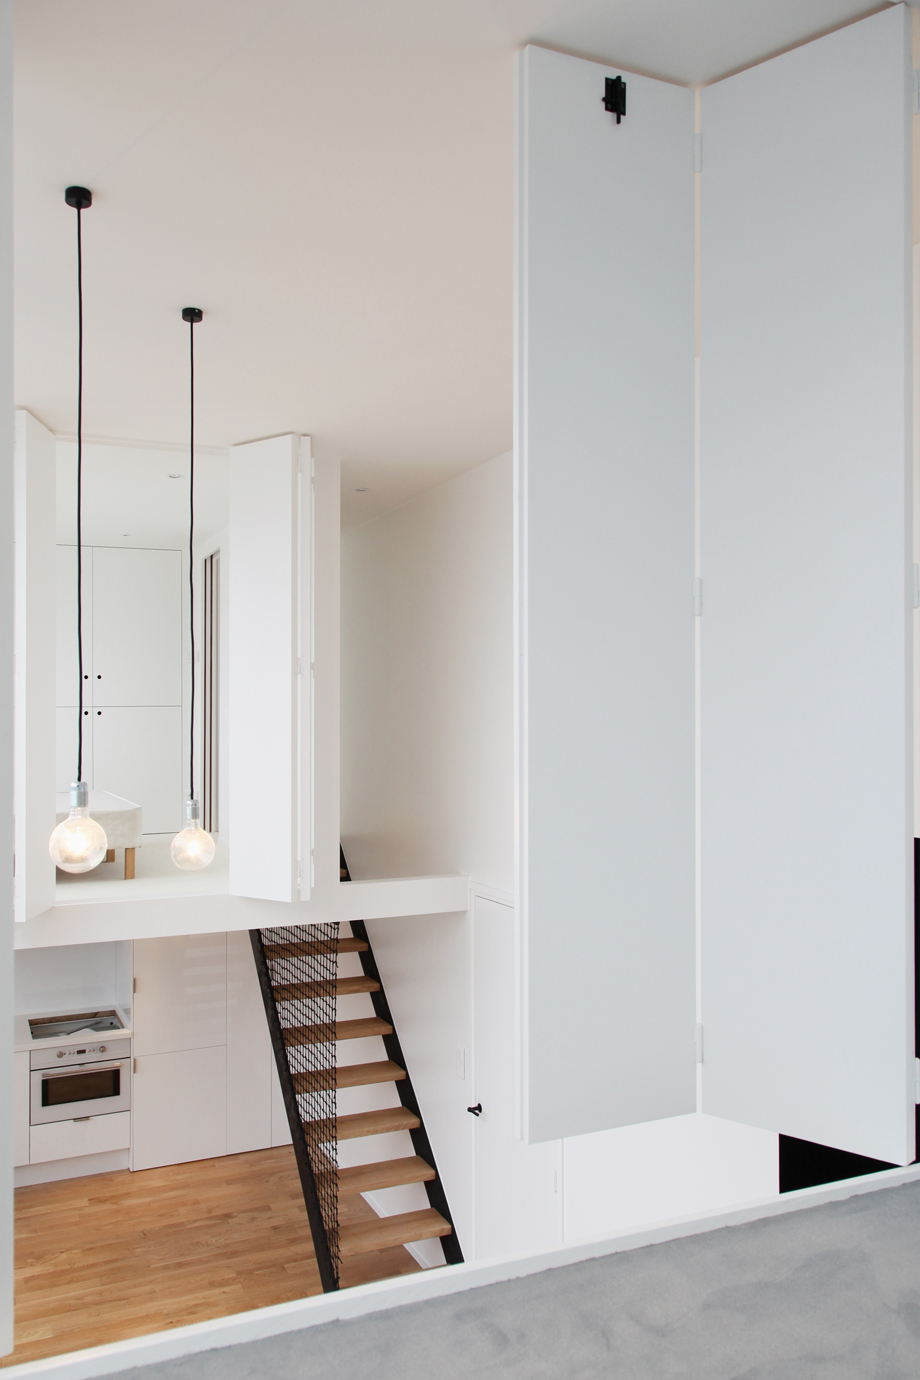 Studio Loft Apartment In Paris With Two Symmetrical